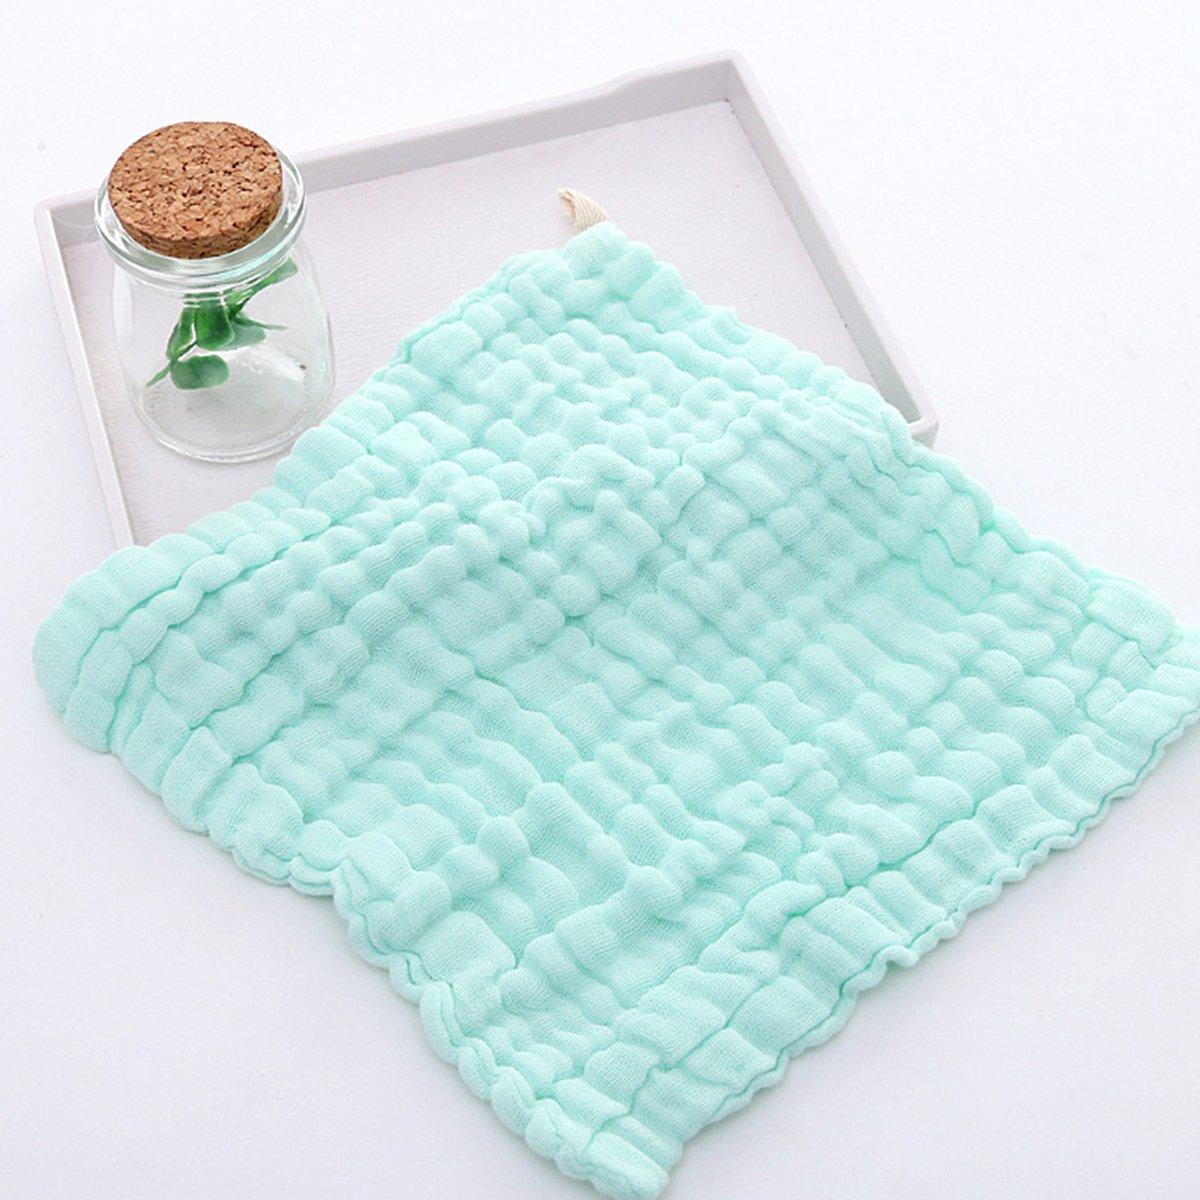 Toallitas de beb/é y muselina paquete de 5 11x11 Tukistore Toalla de beb/é reci/én nacido suave para beb/és Super absorbente de agua para beb/é y beb/és Pieles delicadas